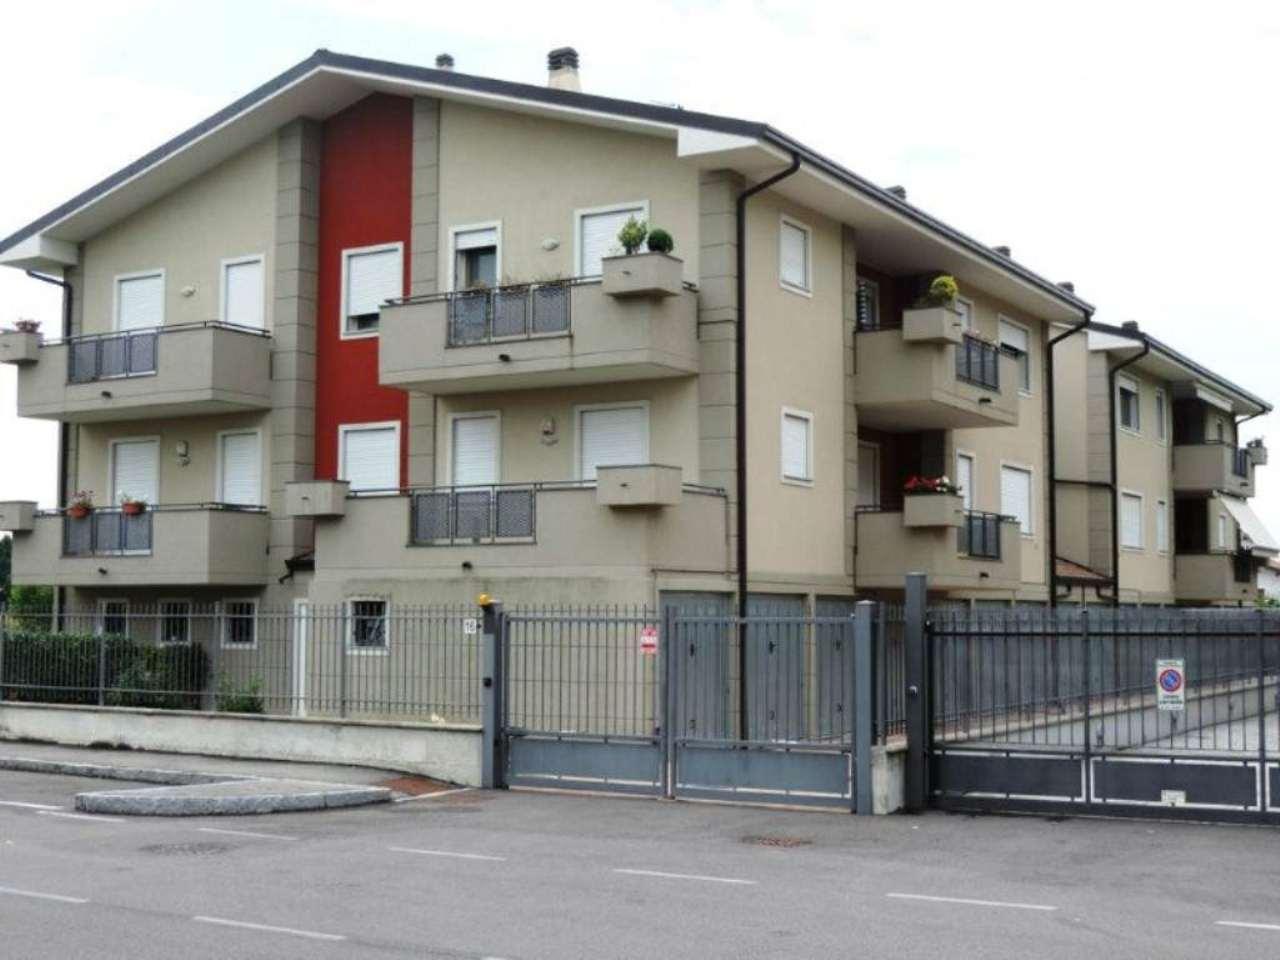 Bilocale Pozzuolo Martesana Via Gendarini 6